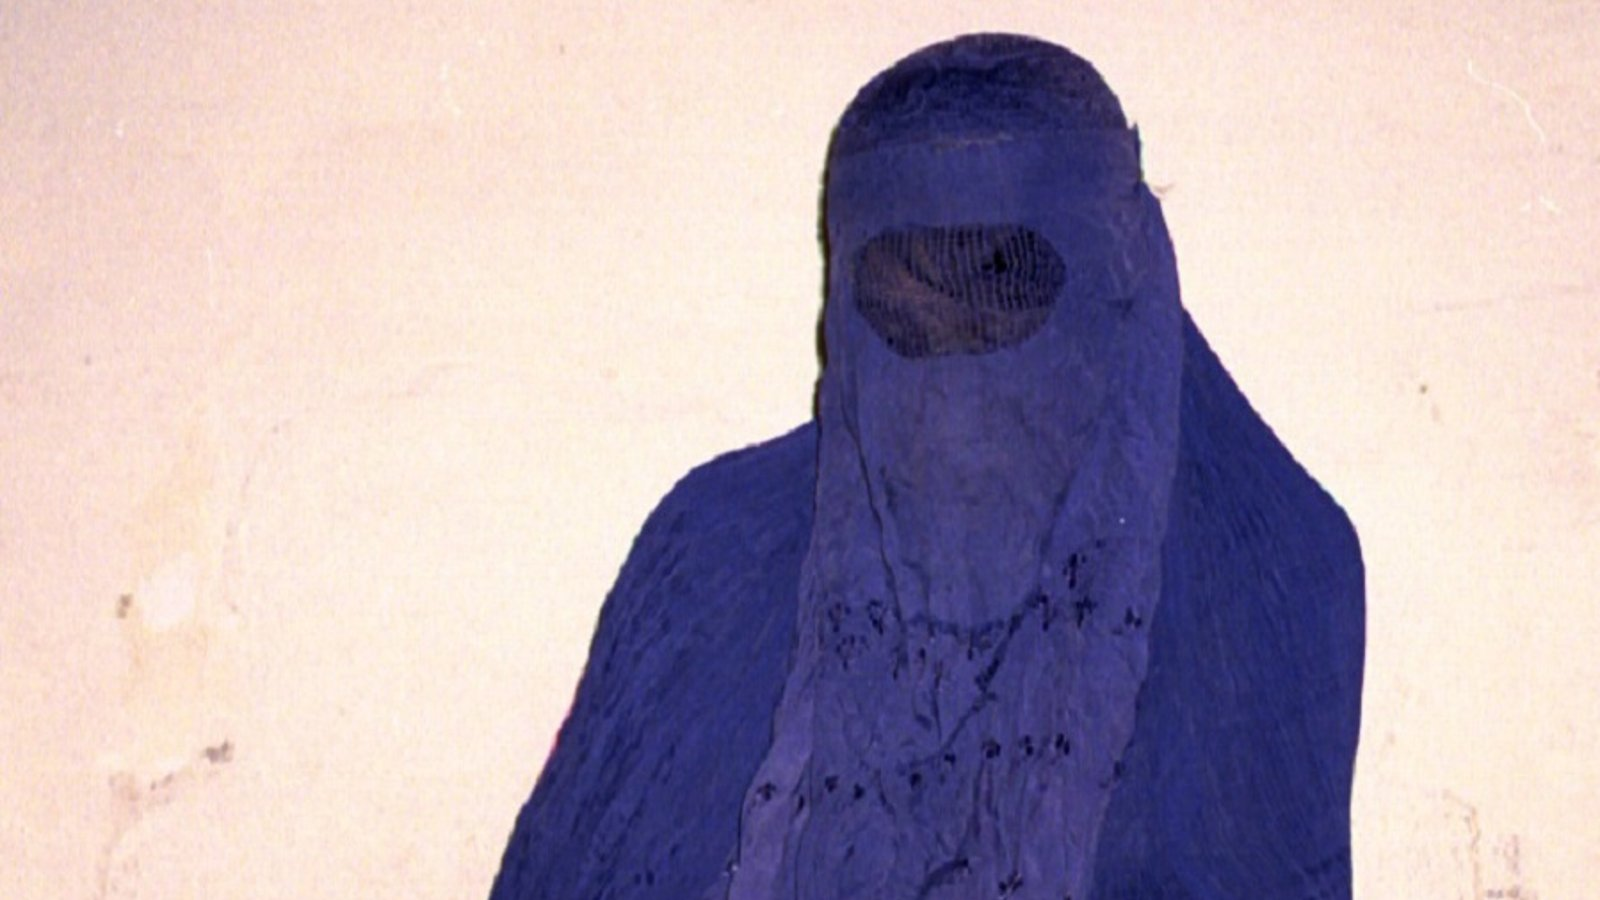 Behind the Veil - Women Fighting Fundamentalism Under the Taliban